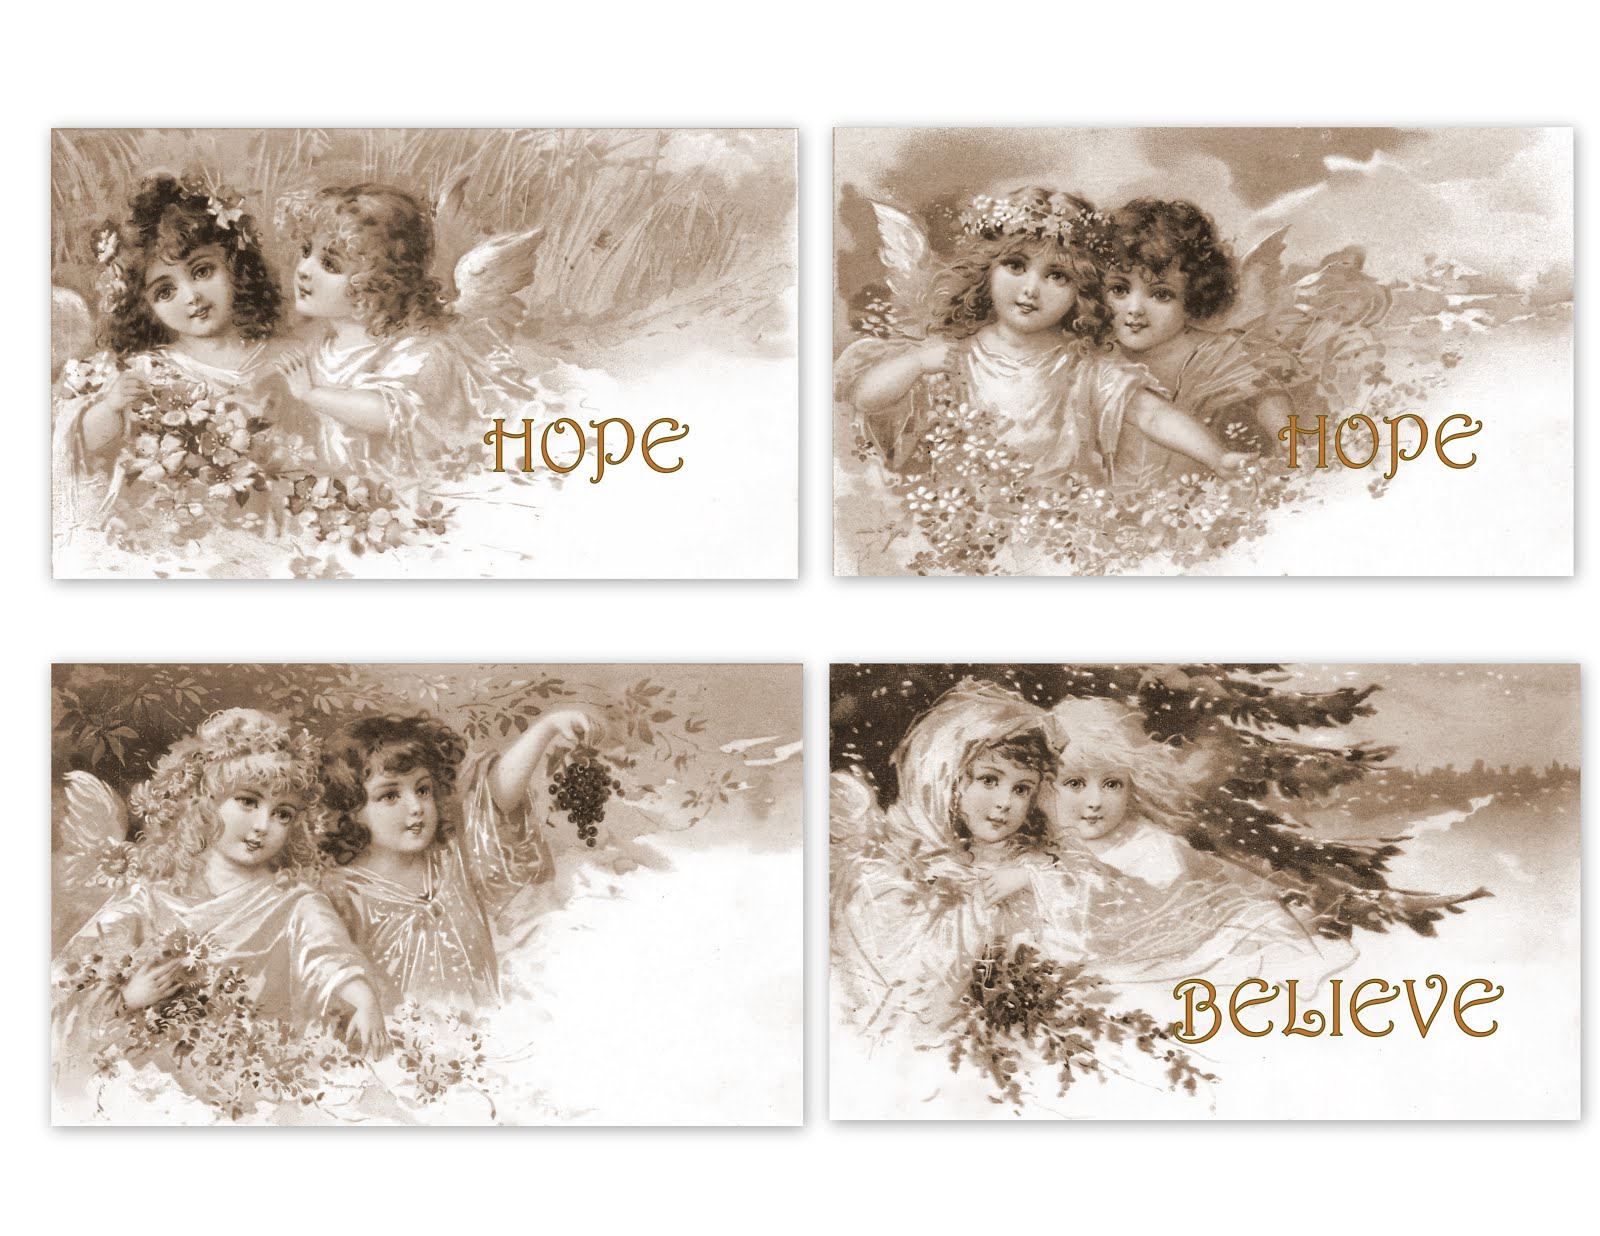 Magic moonlight free images - Vintage bilder kostenlos ...